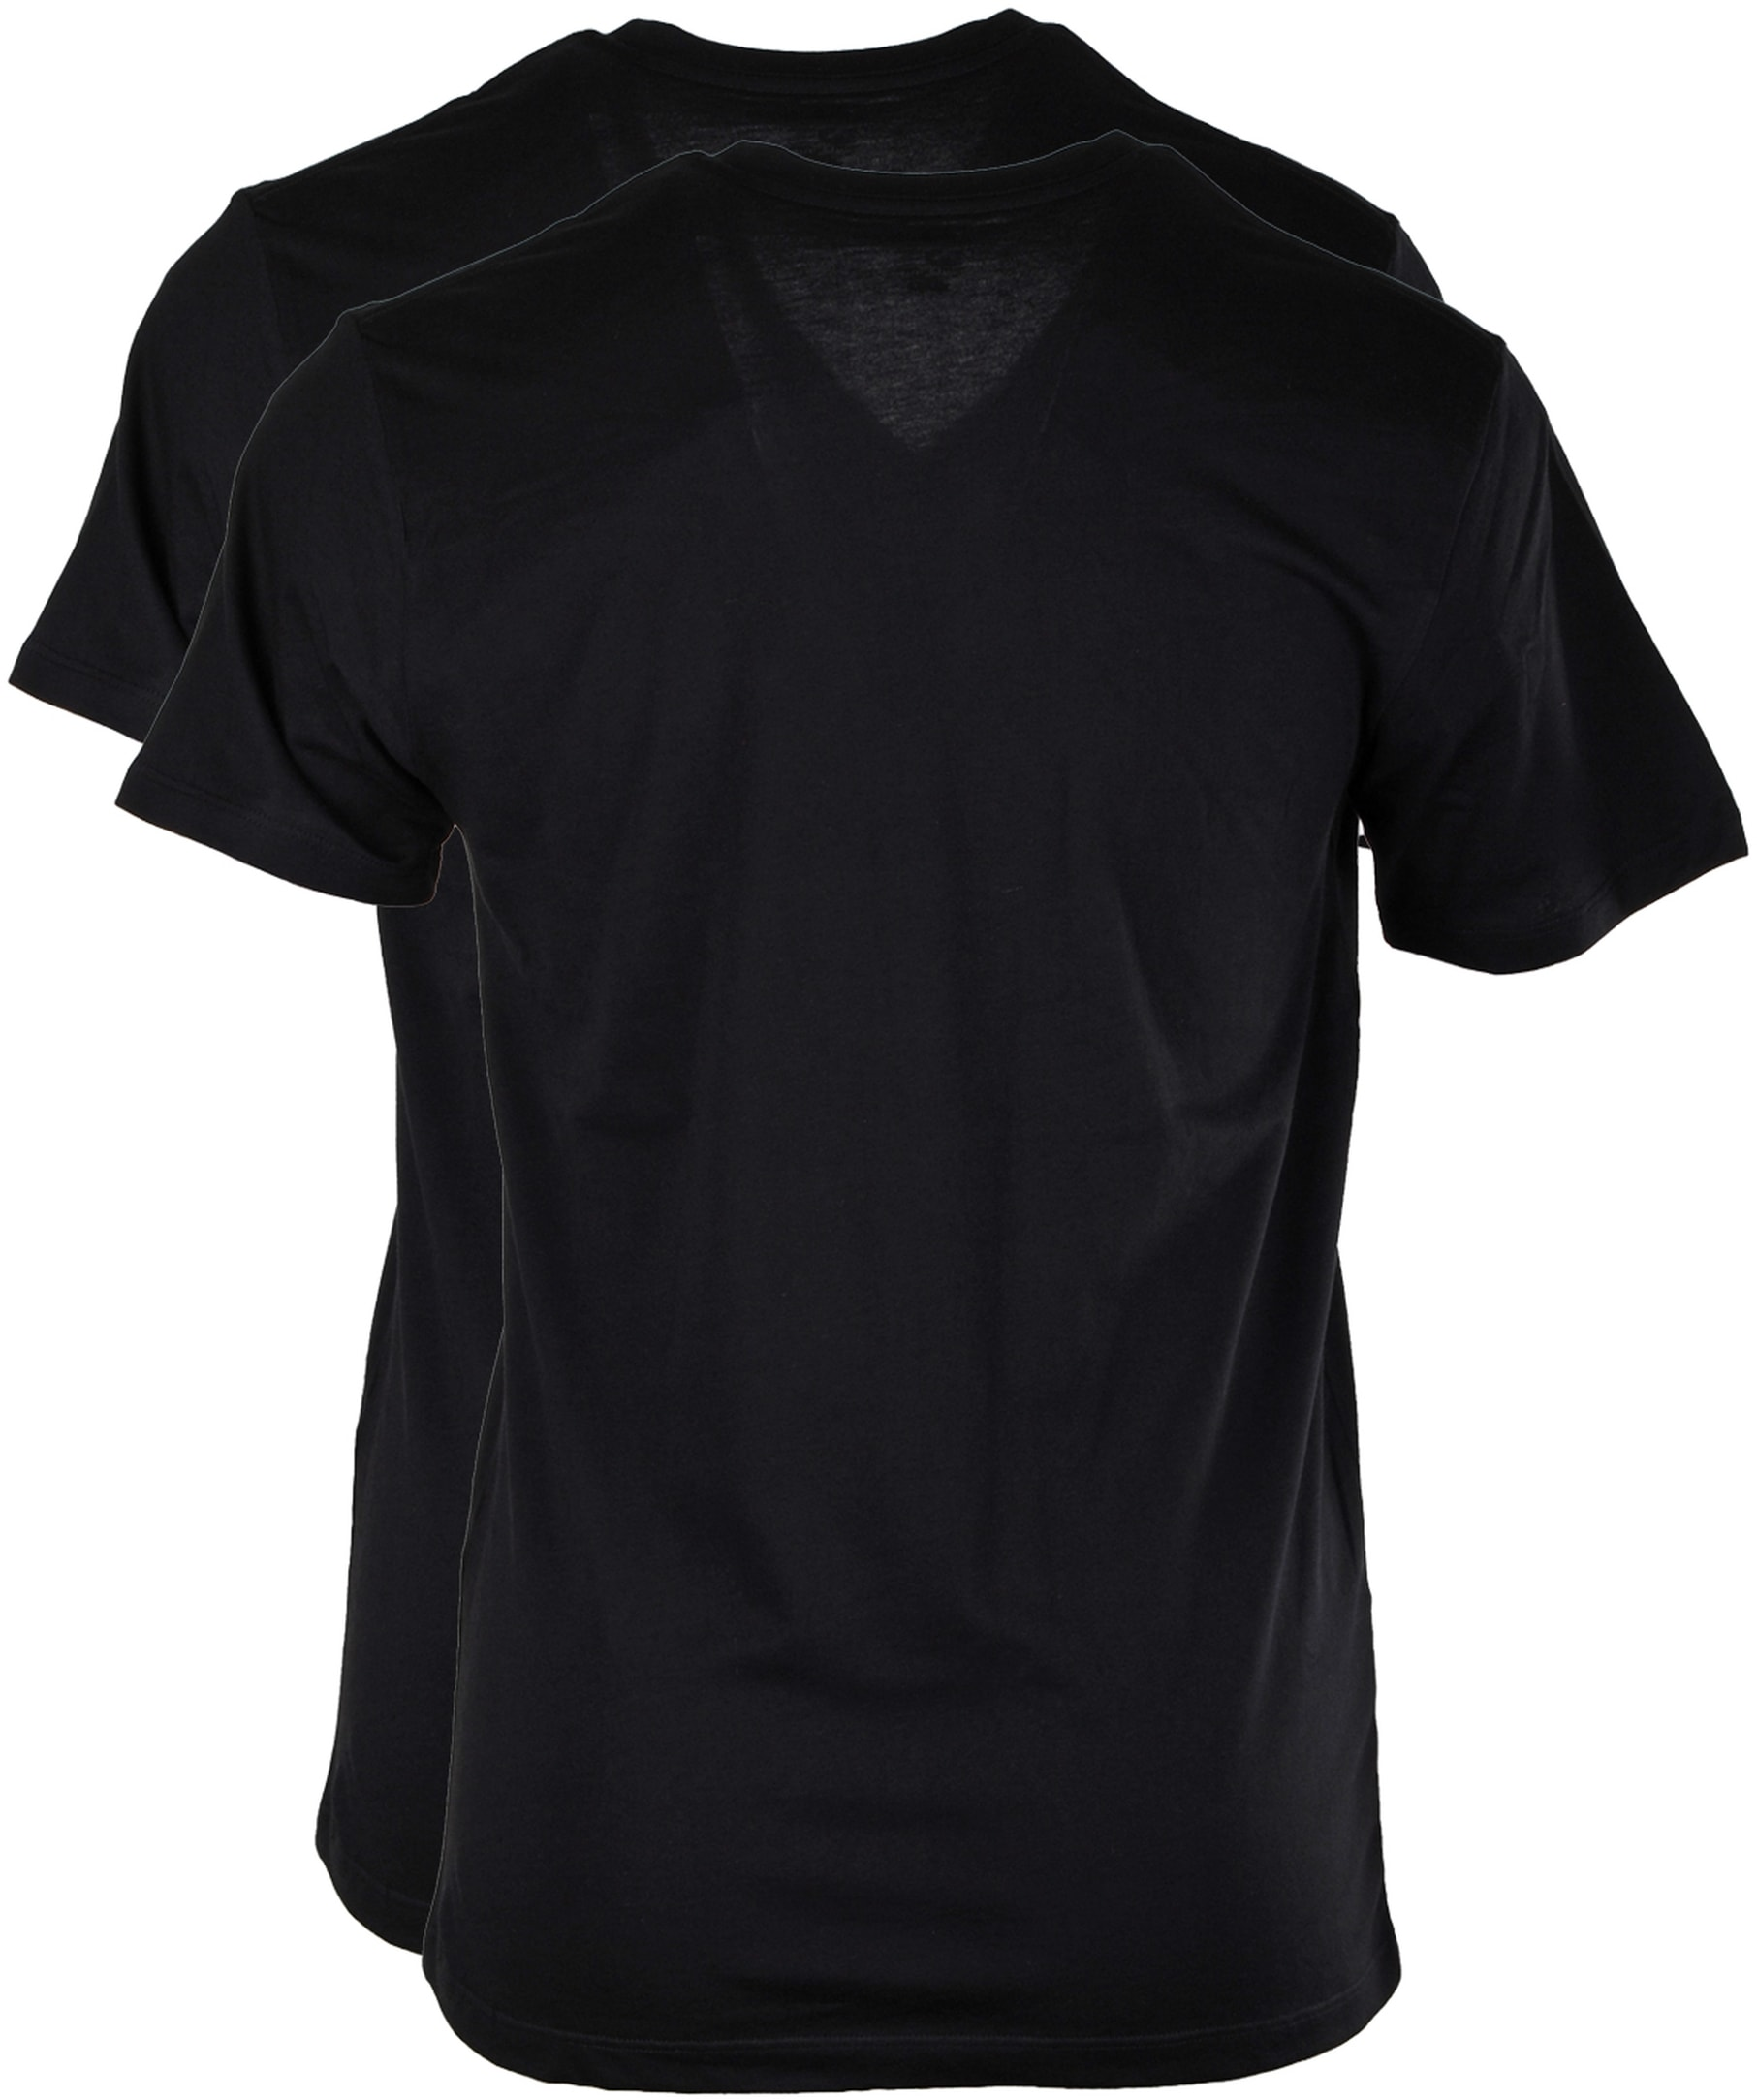 Levi's T-shirt V-Neck Black 2-Pack foto 1